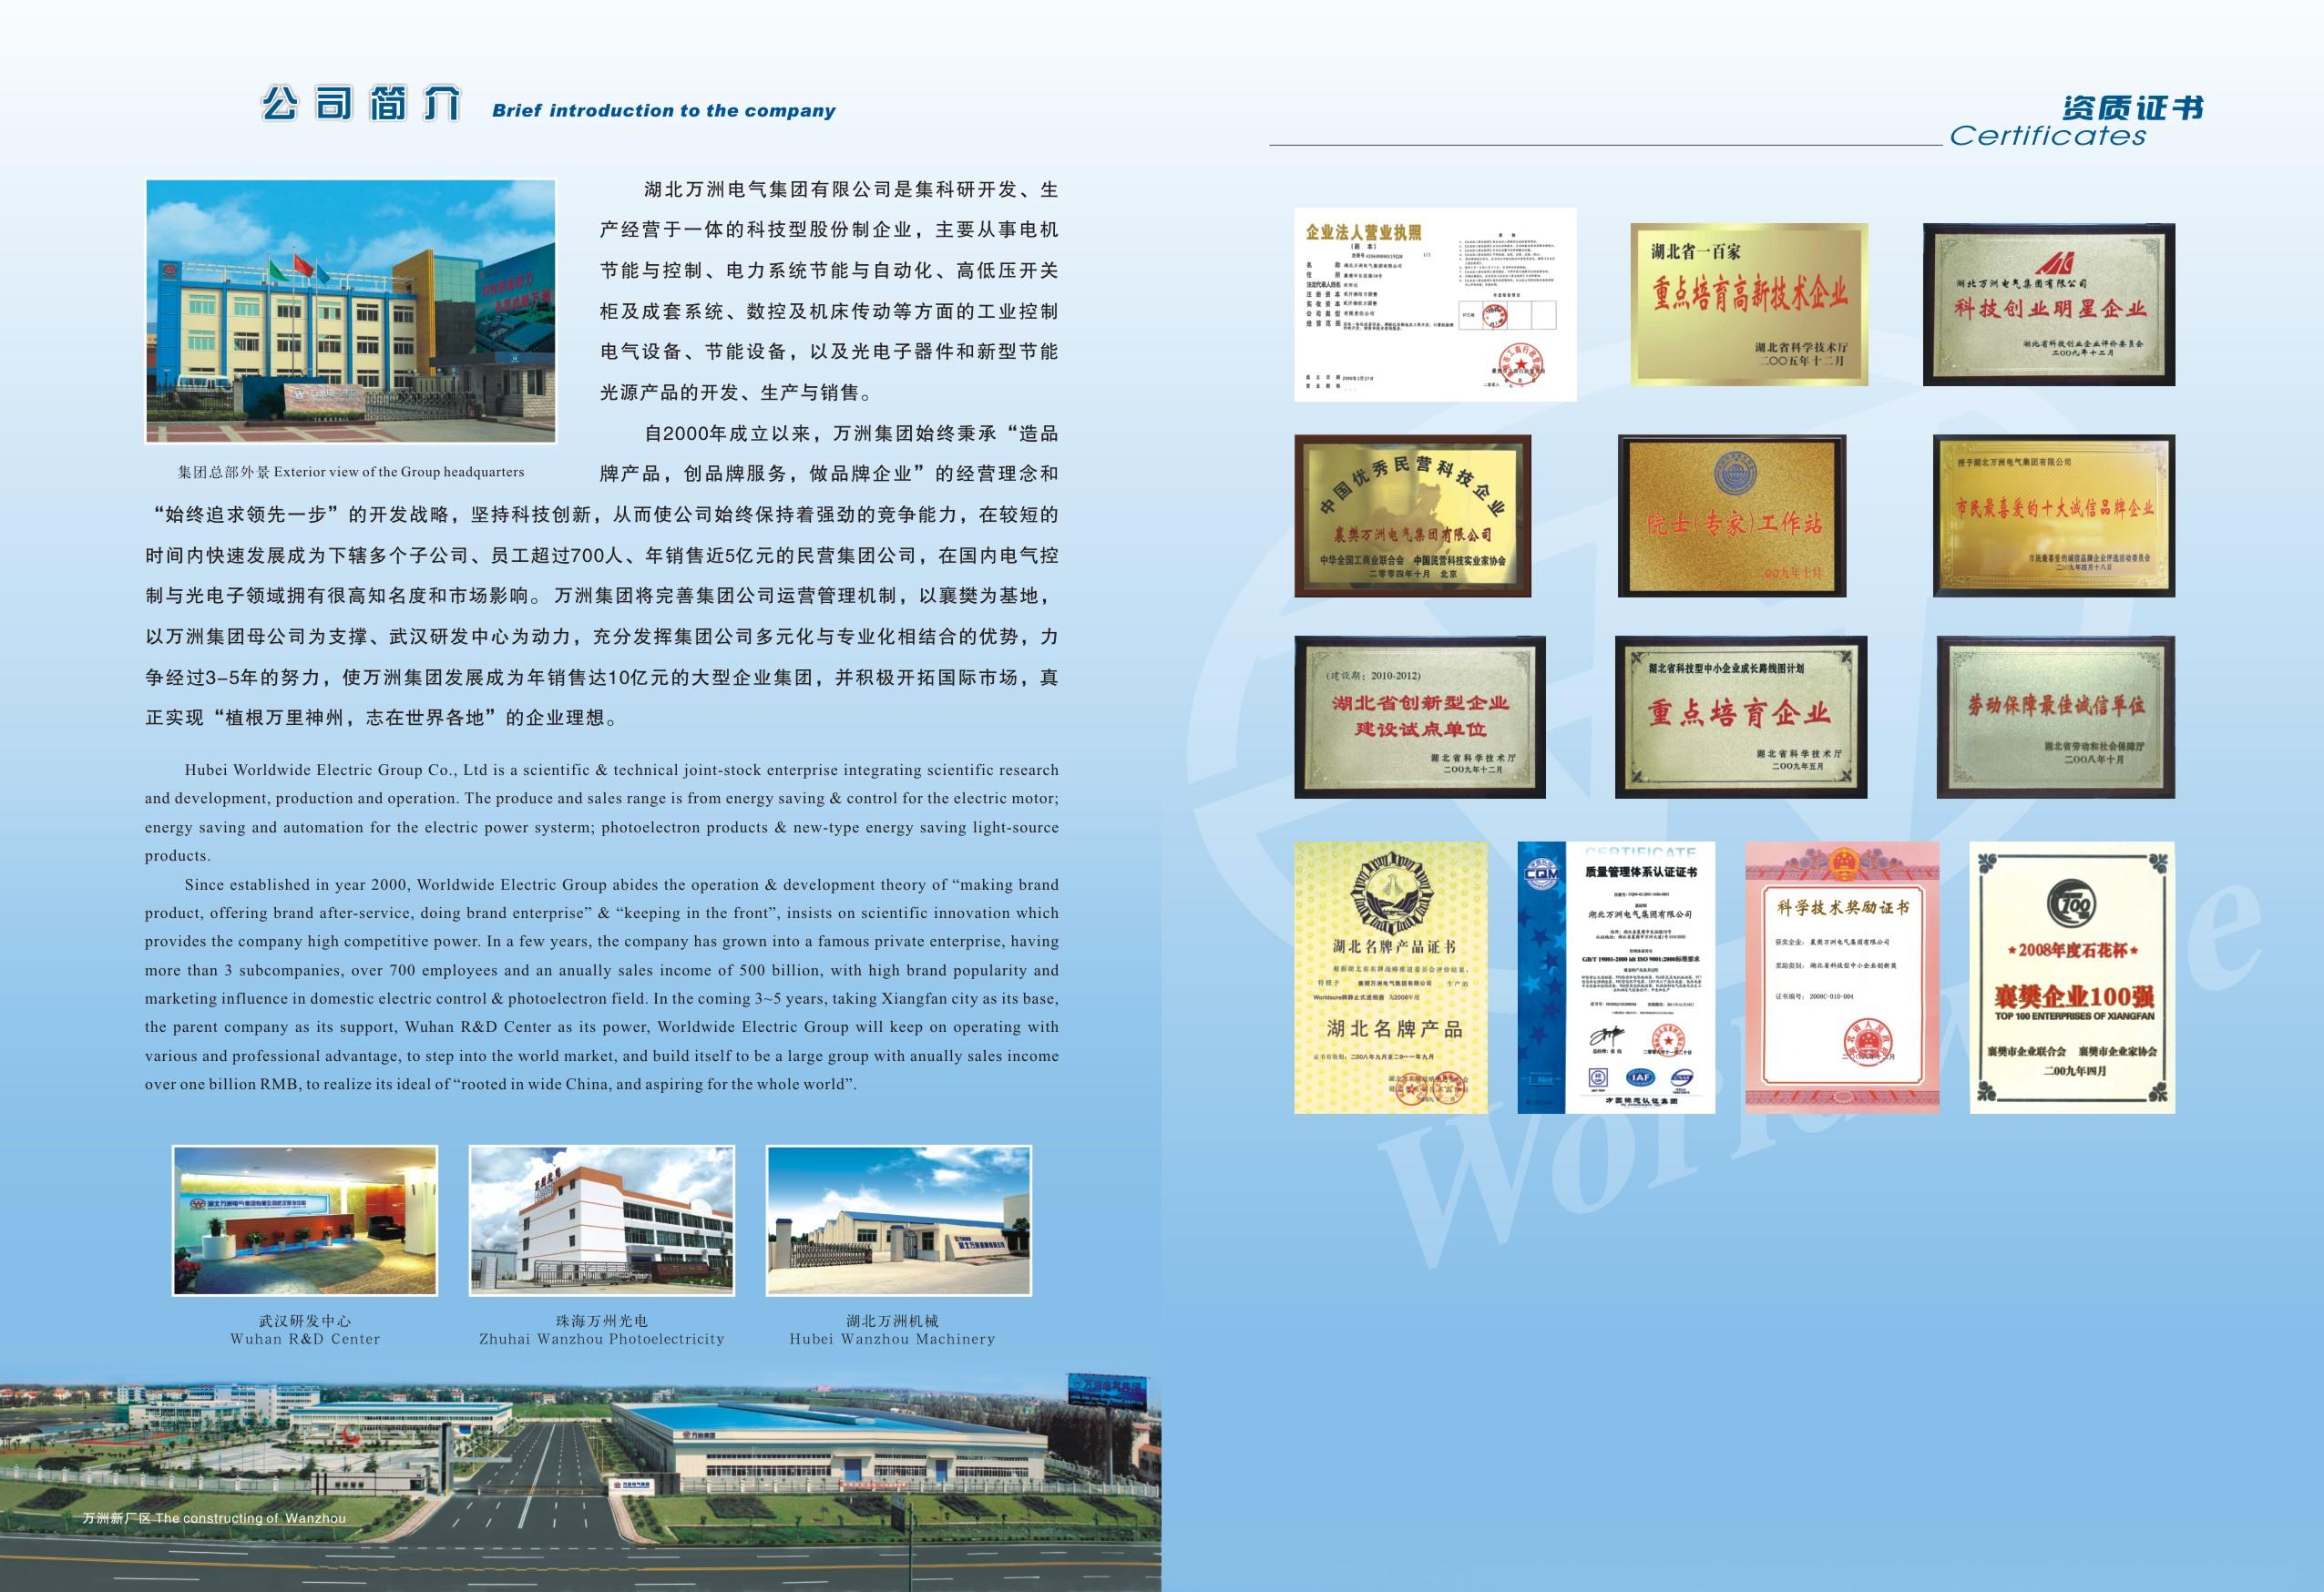 Worldwide electric stock company Main Image